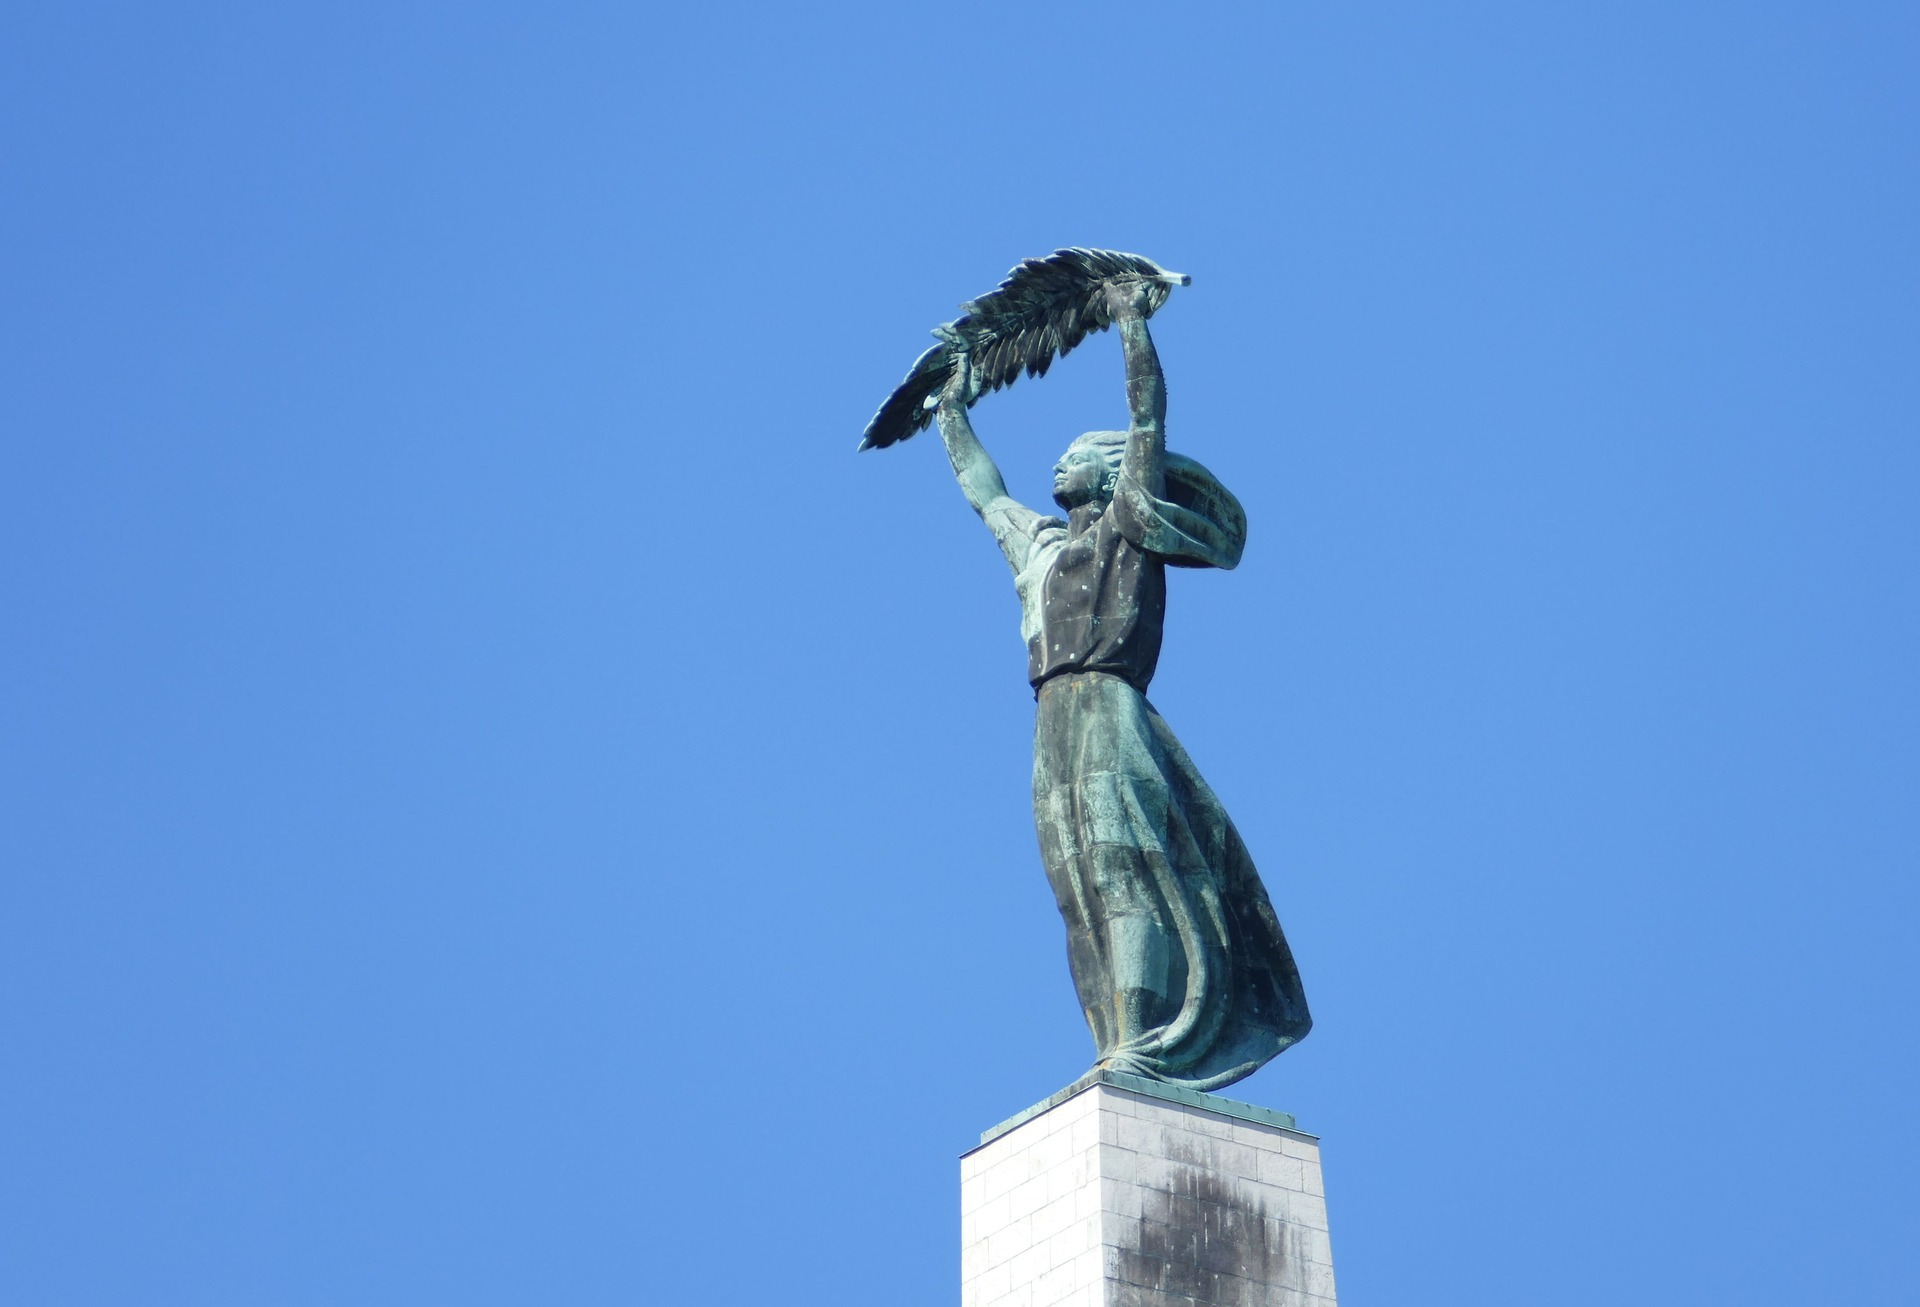 budapest-2529158_1920.jpg